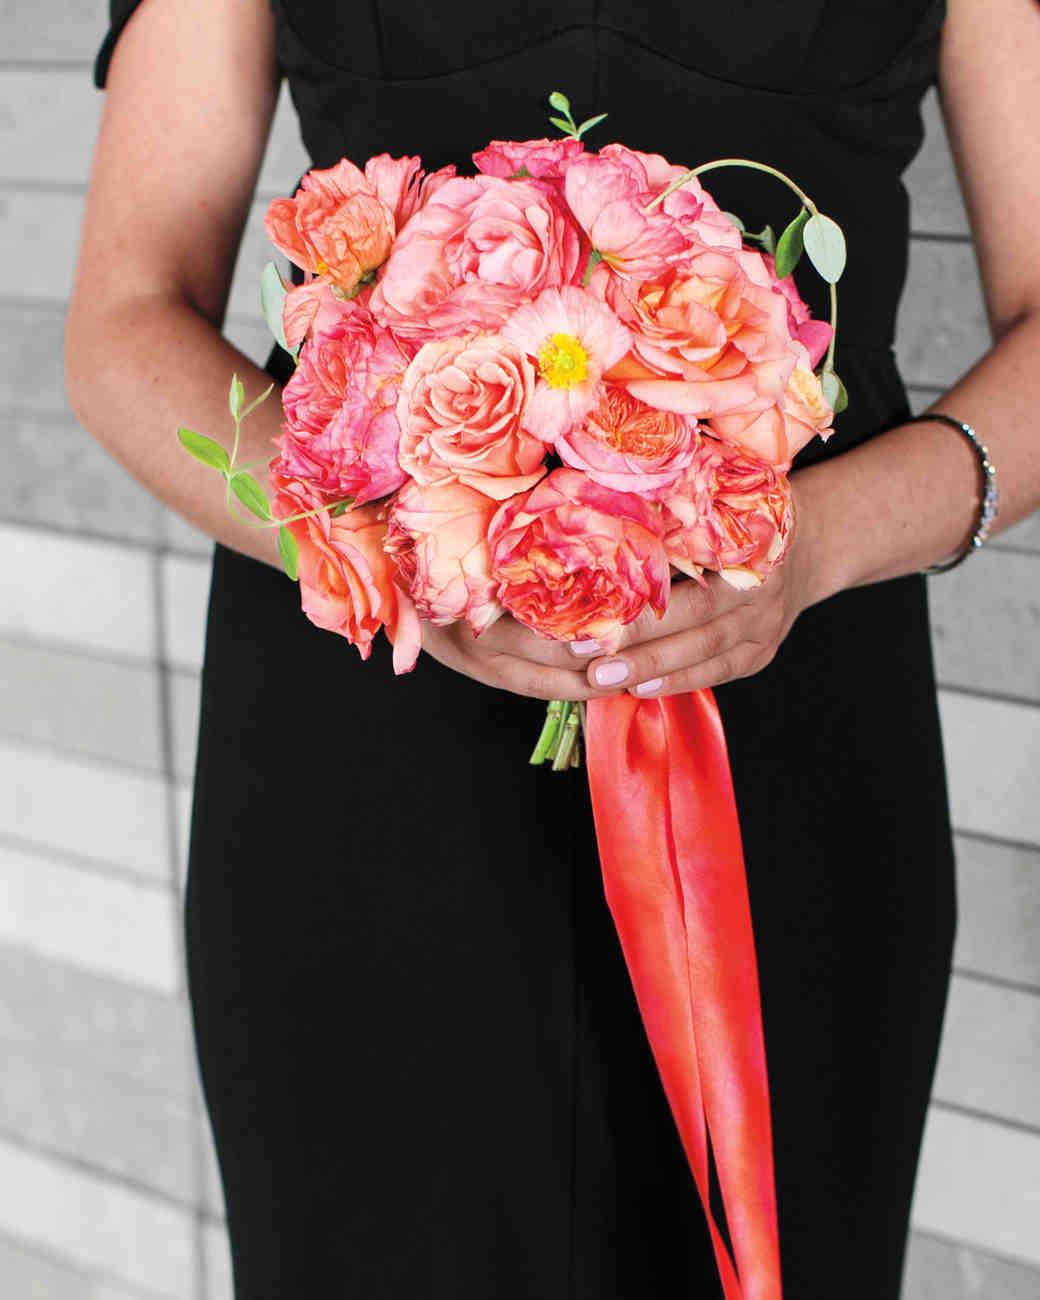 hanna-bret-bouquet-details-0093-s111676.jpg